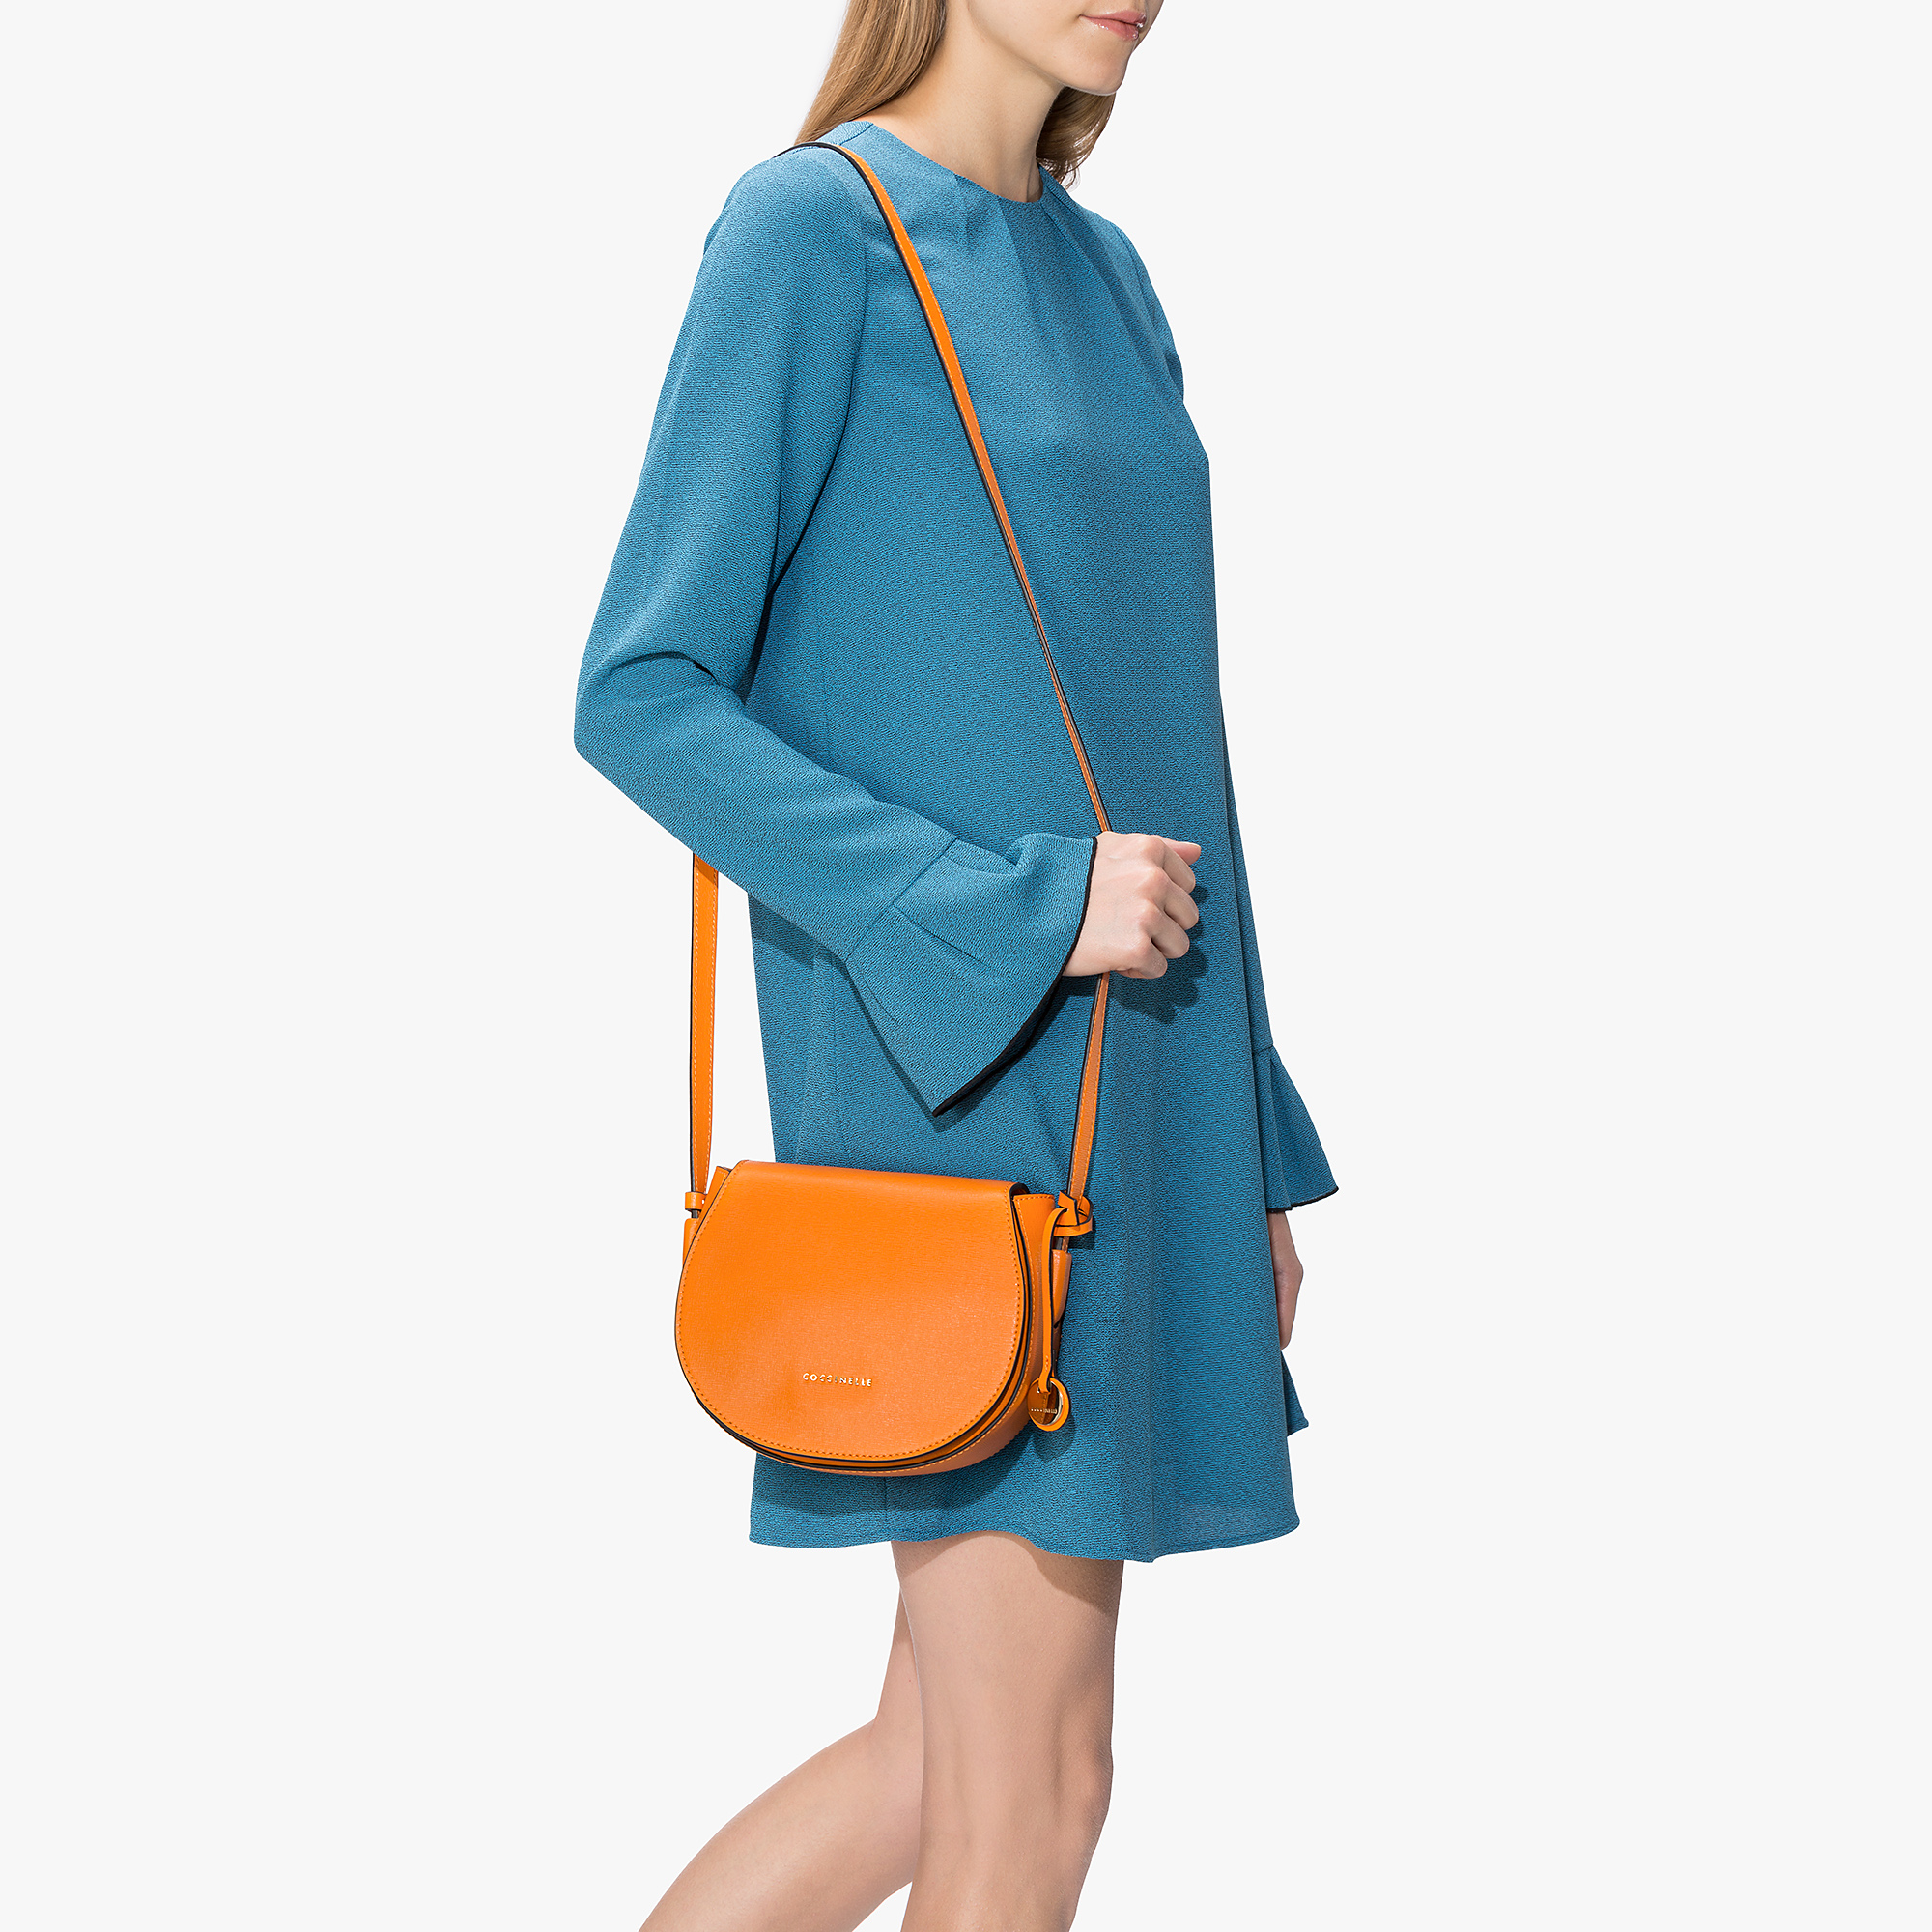 Coccinelle Clementine saffiano leather bandolier bag